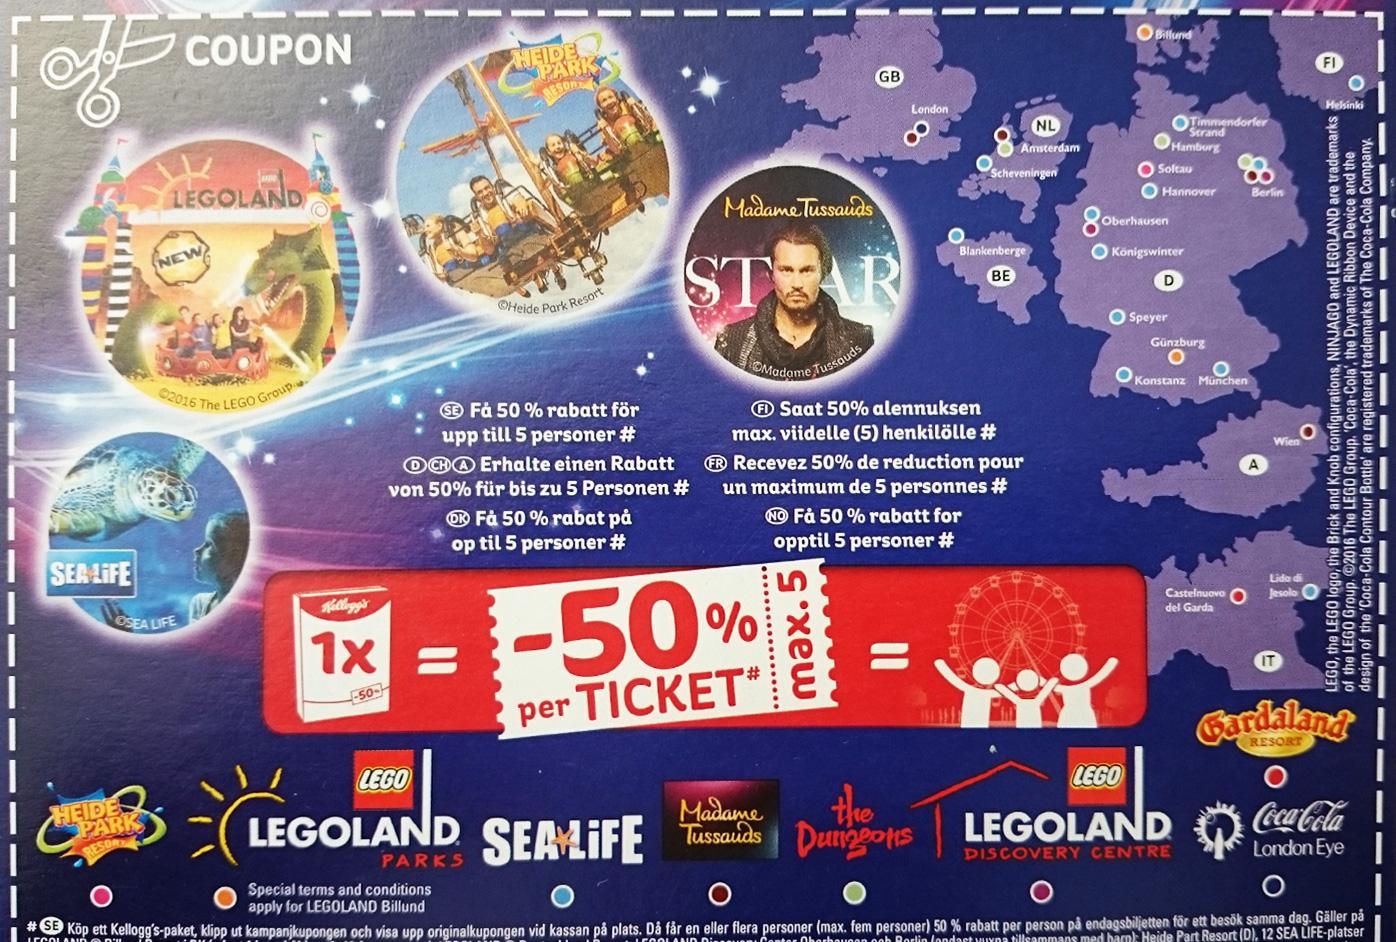 (Grensdeal) 50% KORTING via Kellogs op heel veel Europese pretparken (Legoland, Heidepark, Madam Tussaud, London Eye etc etc)